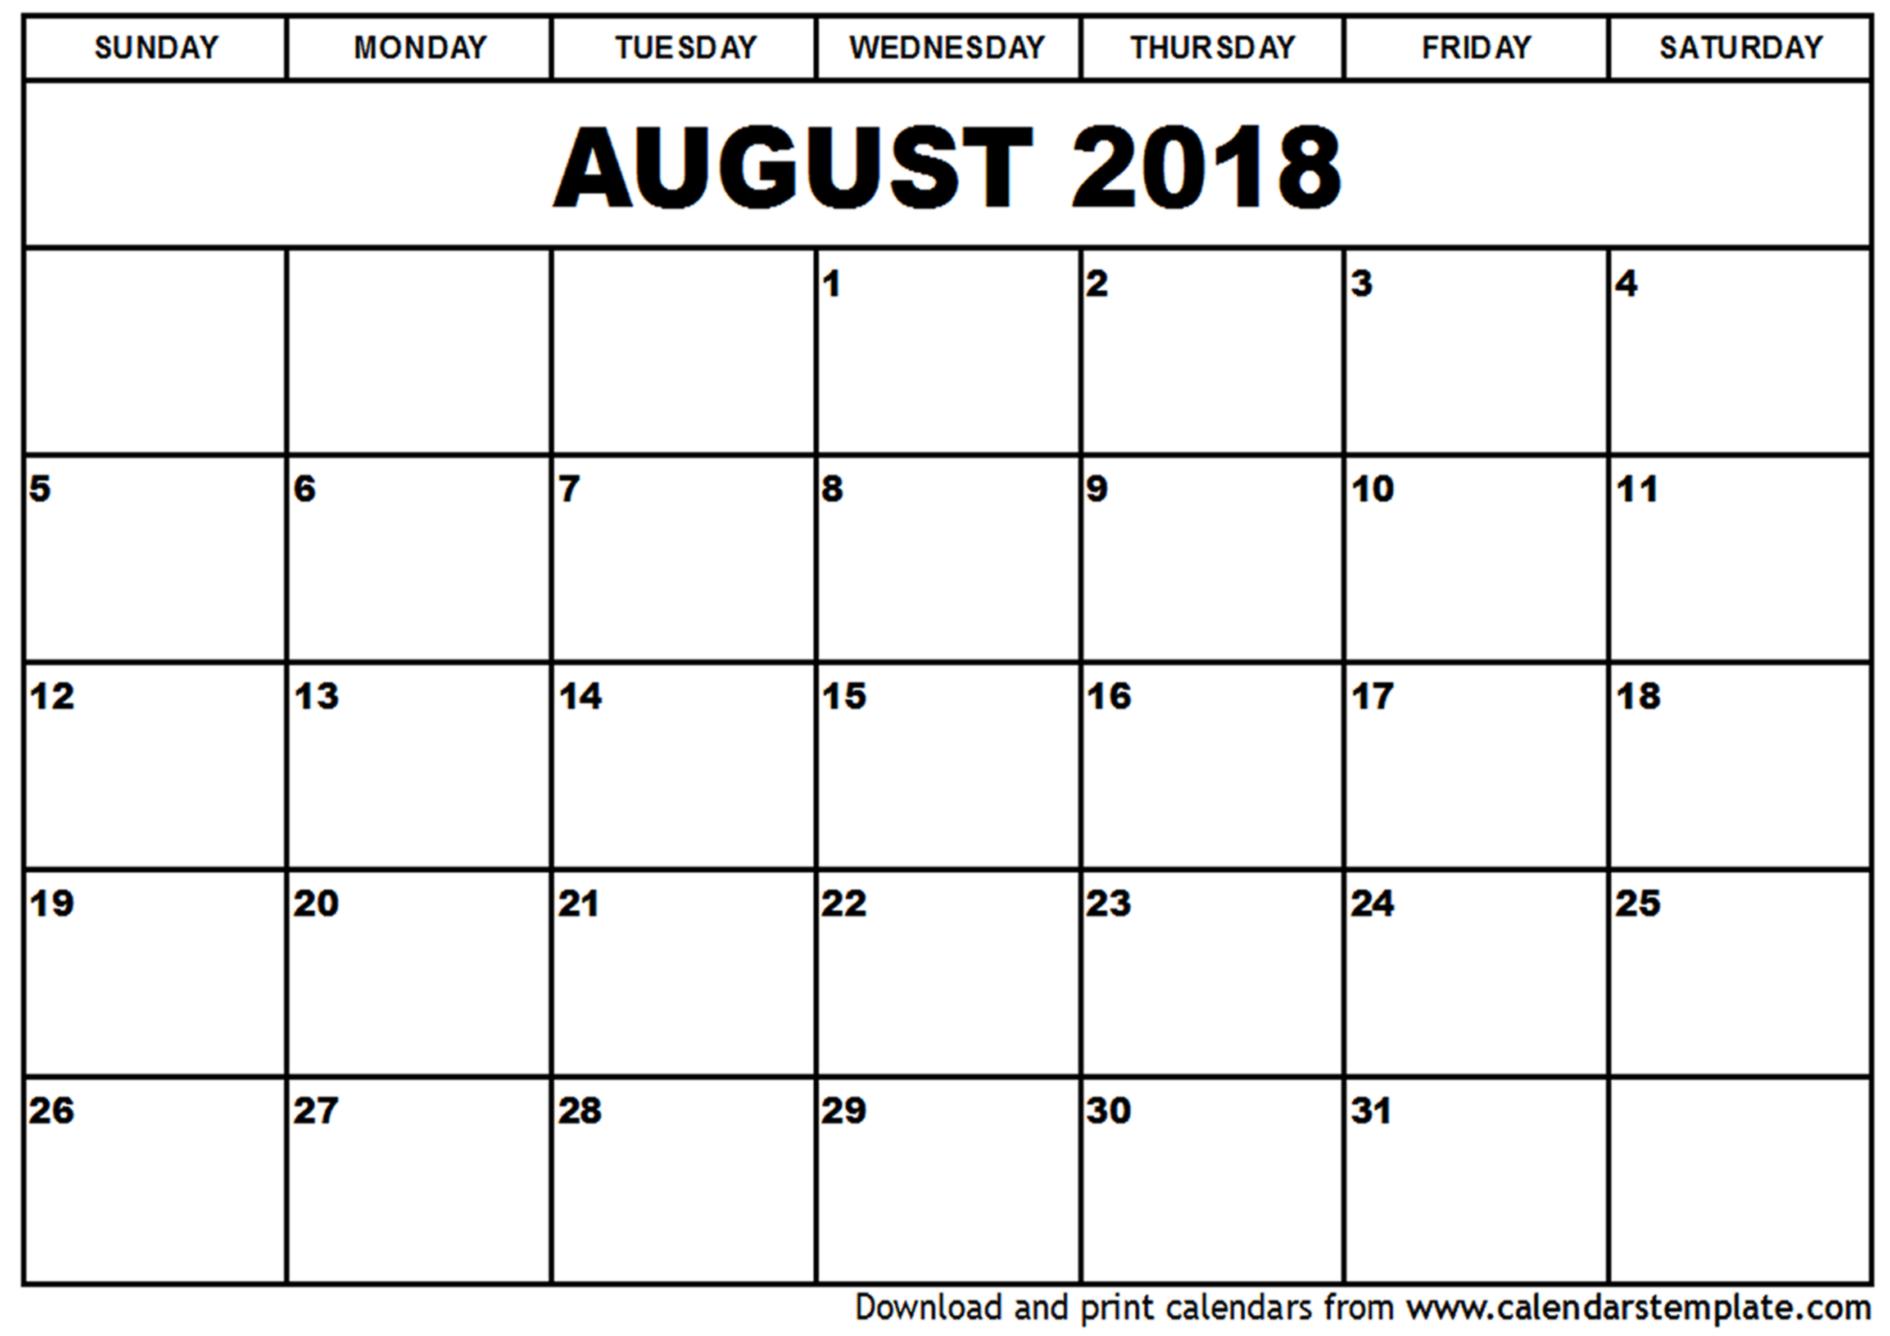 blank august 2018 calendar printable Targer.golden dragon.co